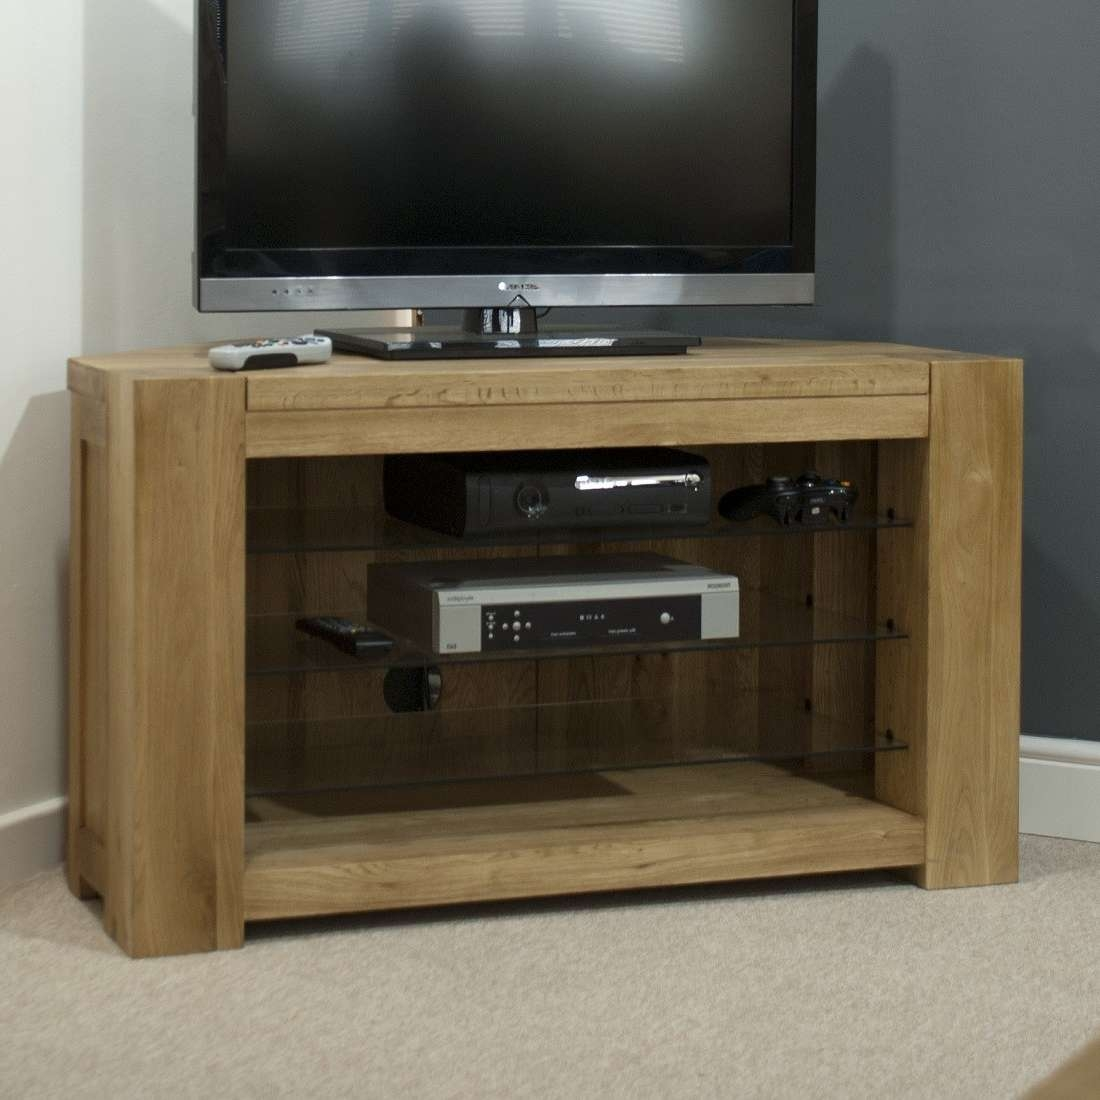 Trend Solid Oak Corner Tv Unit | Oak Furniture Uk With Solid Wood Corner Tv Cabinets (View 5 of 20)